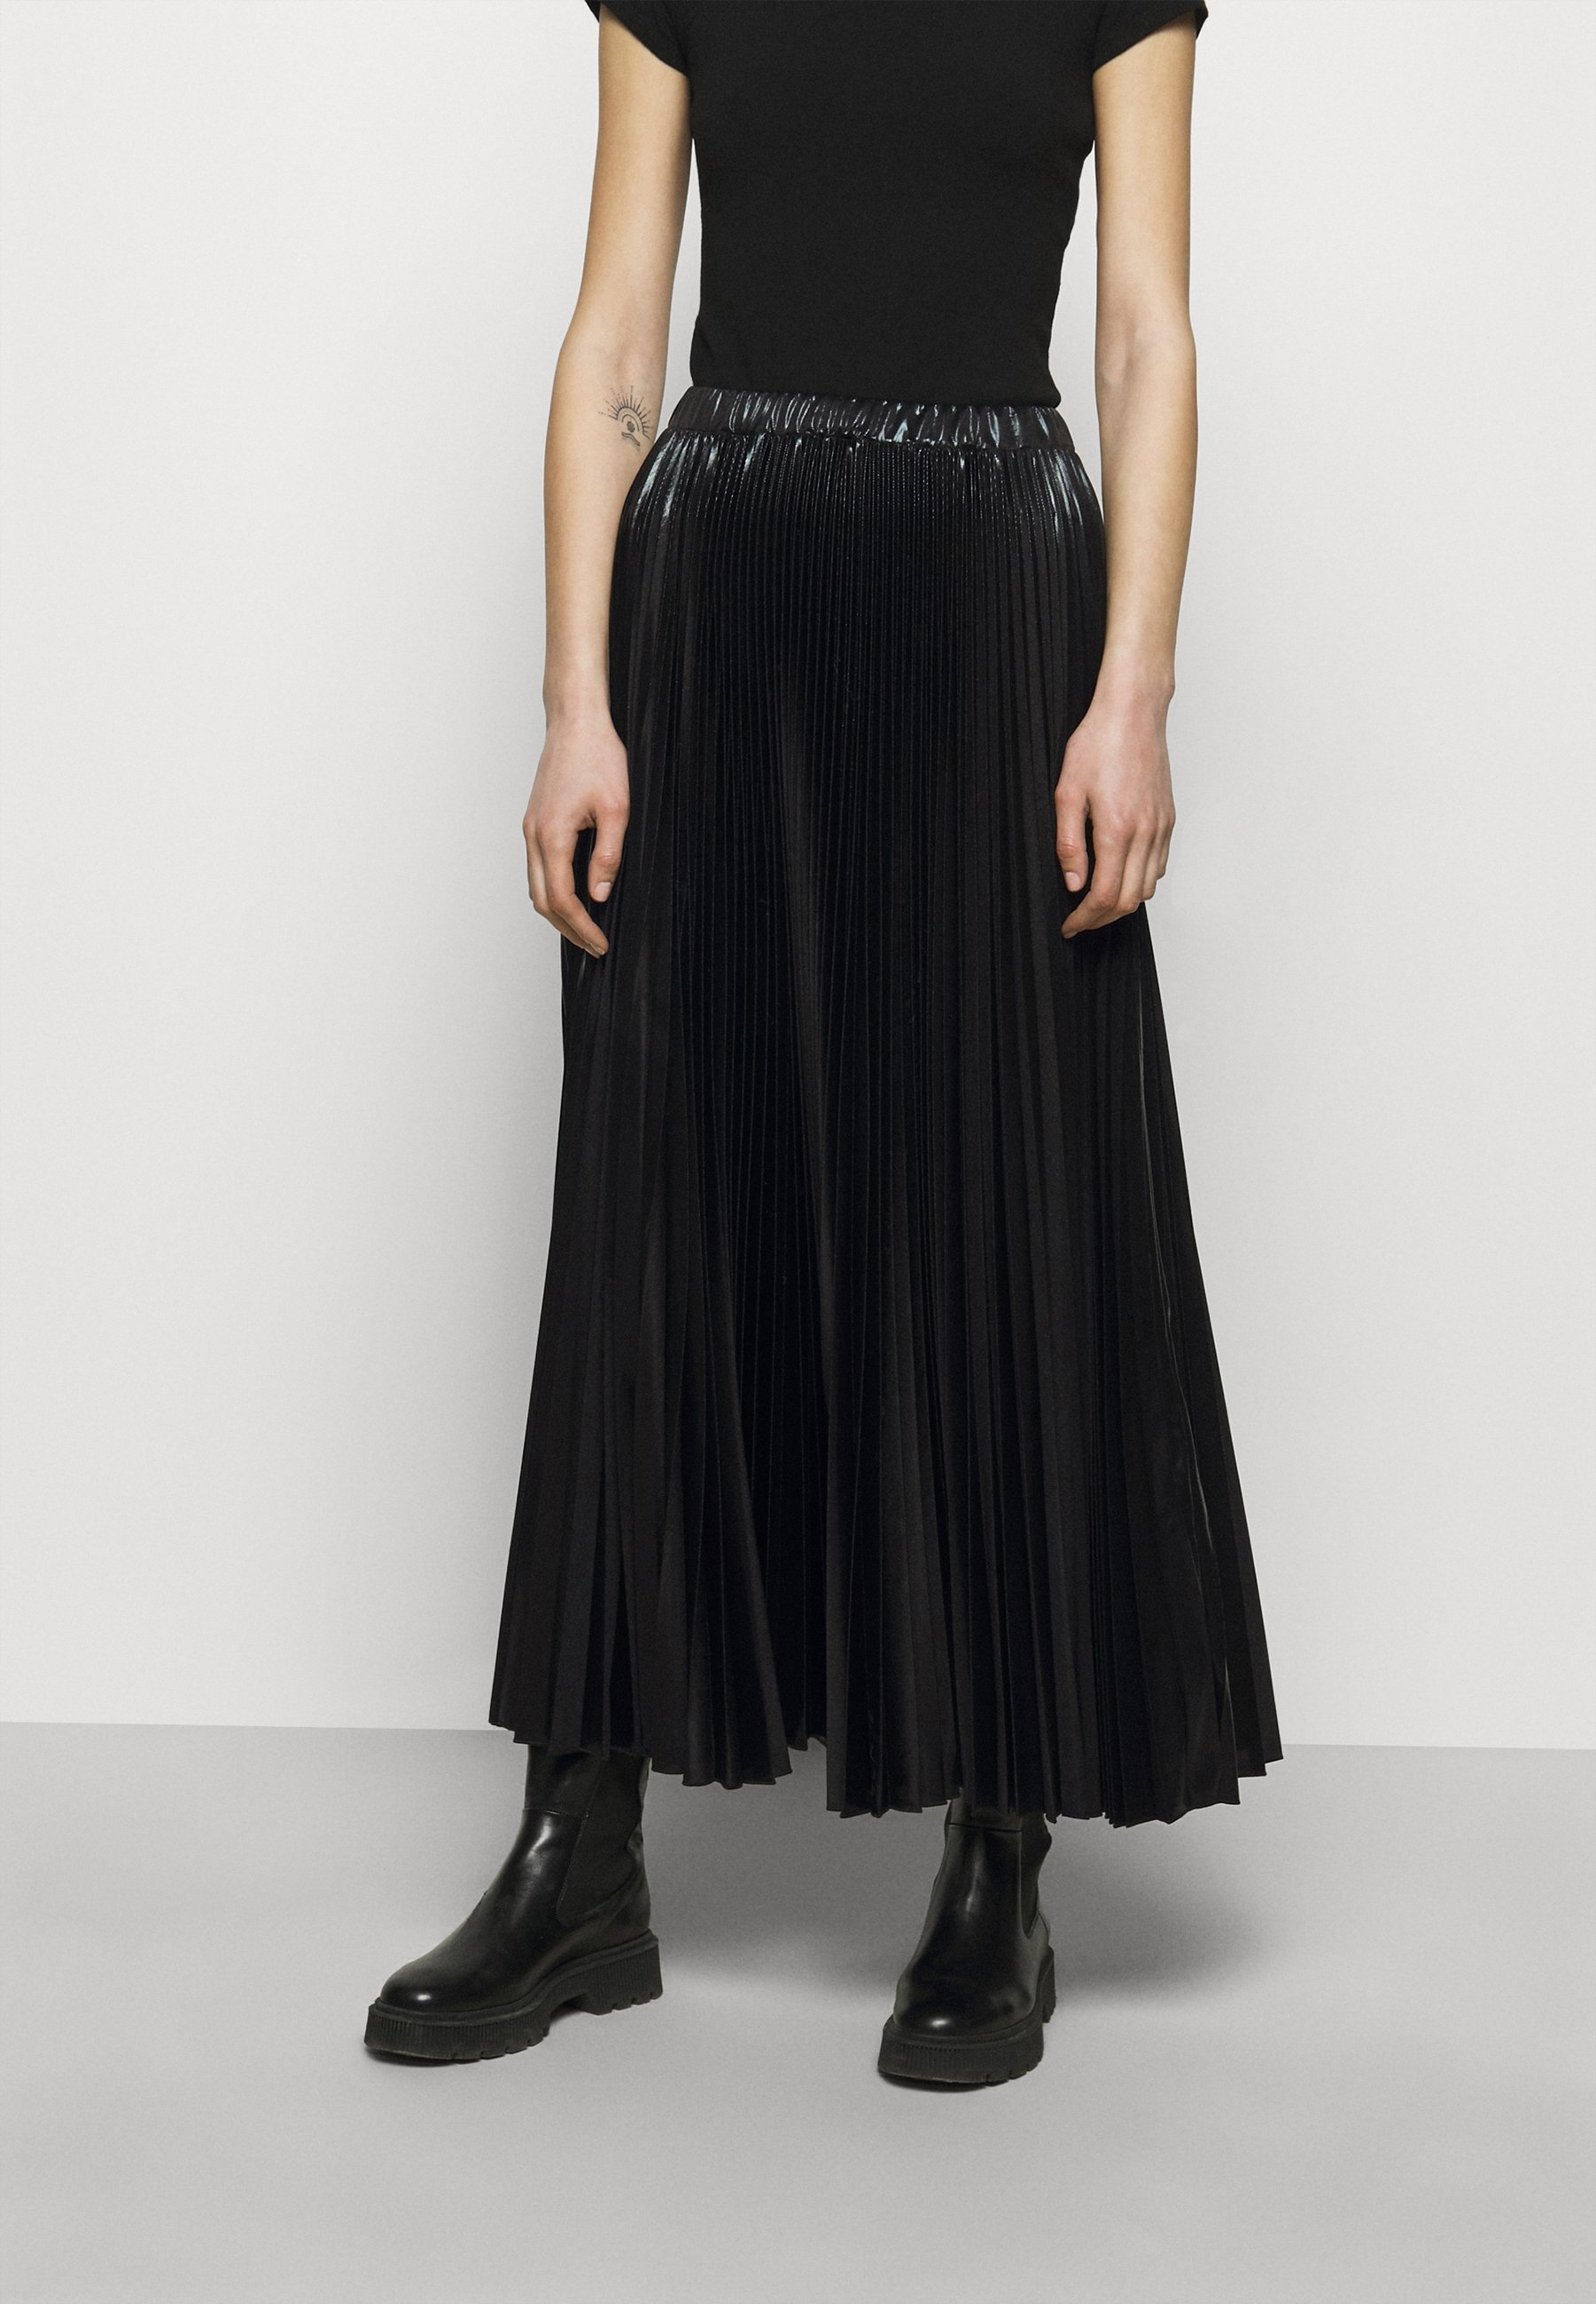 Femme PRESENZA - Jupe plissée